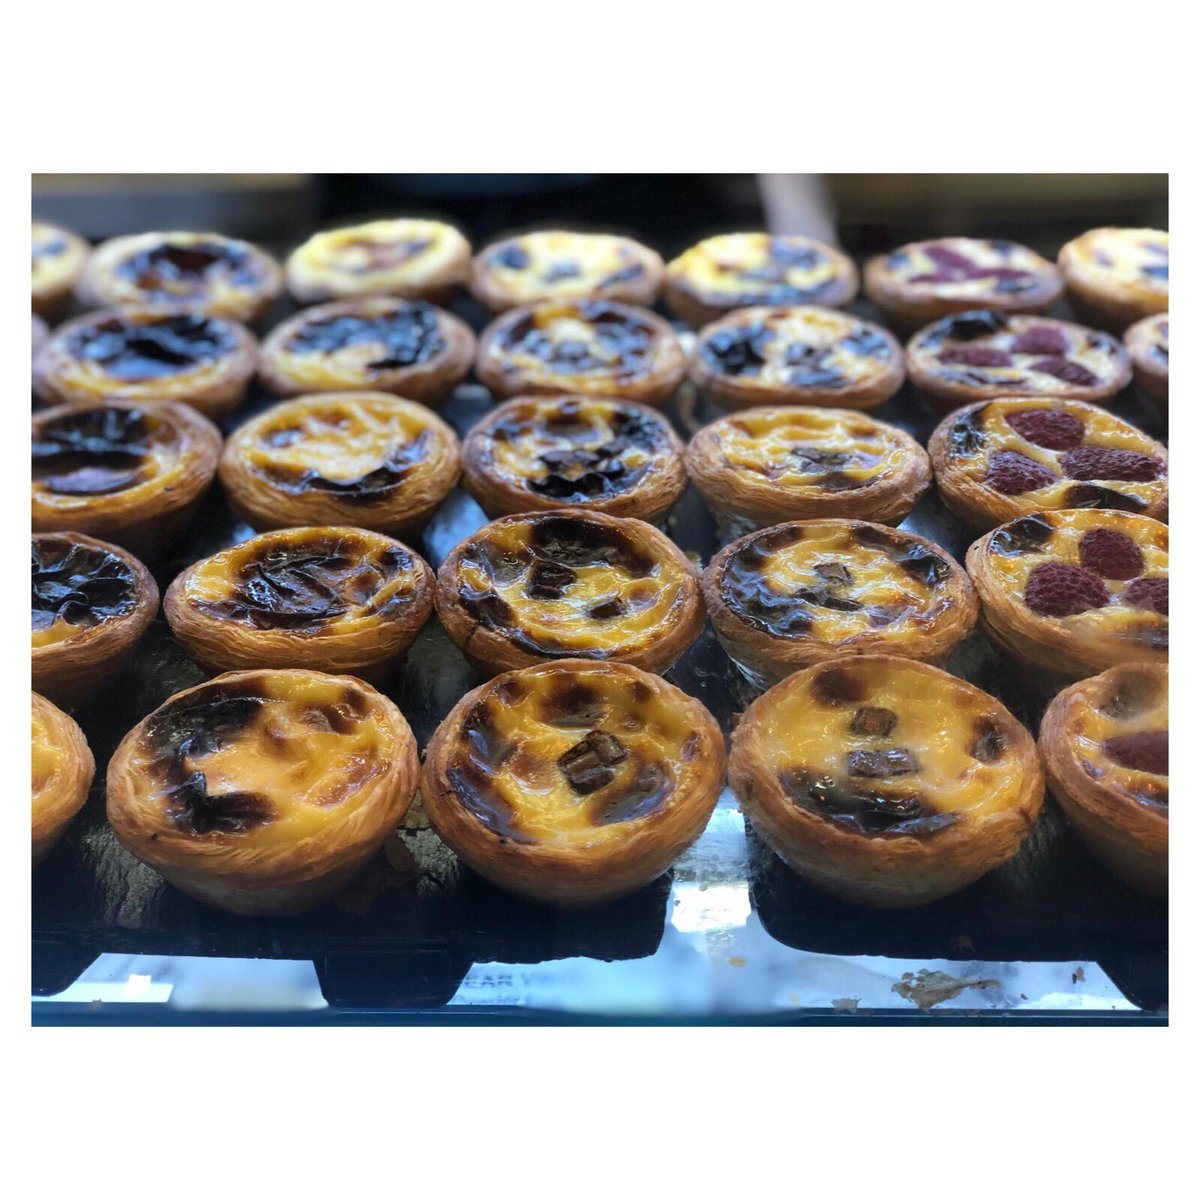 It's Saturday so I'll have one of each 🤤  #cafedenata #pasteisdenata #custardtarts #coffee #cafe #strawberry #chocolate #blueberry #apple #cinnamon #coconut #raspberry #classic #latte #nomnom #yum #weekendvibes #london #soho #hammersmith #southkensington #portugal #pastelaria